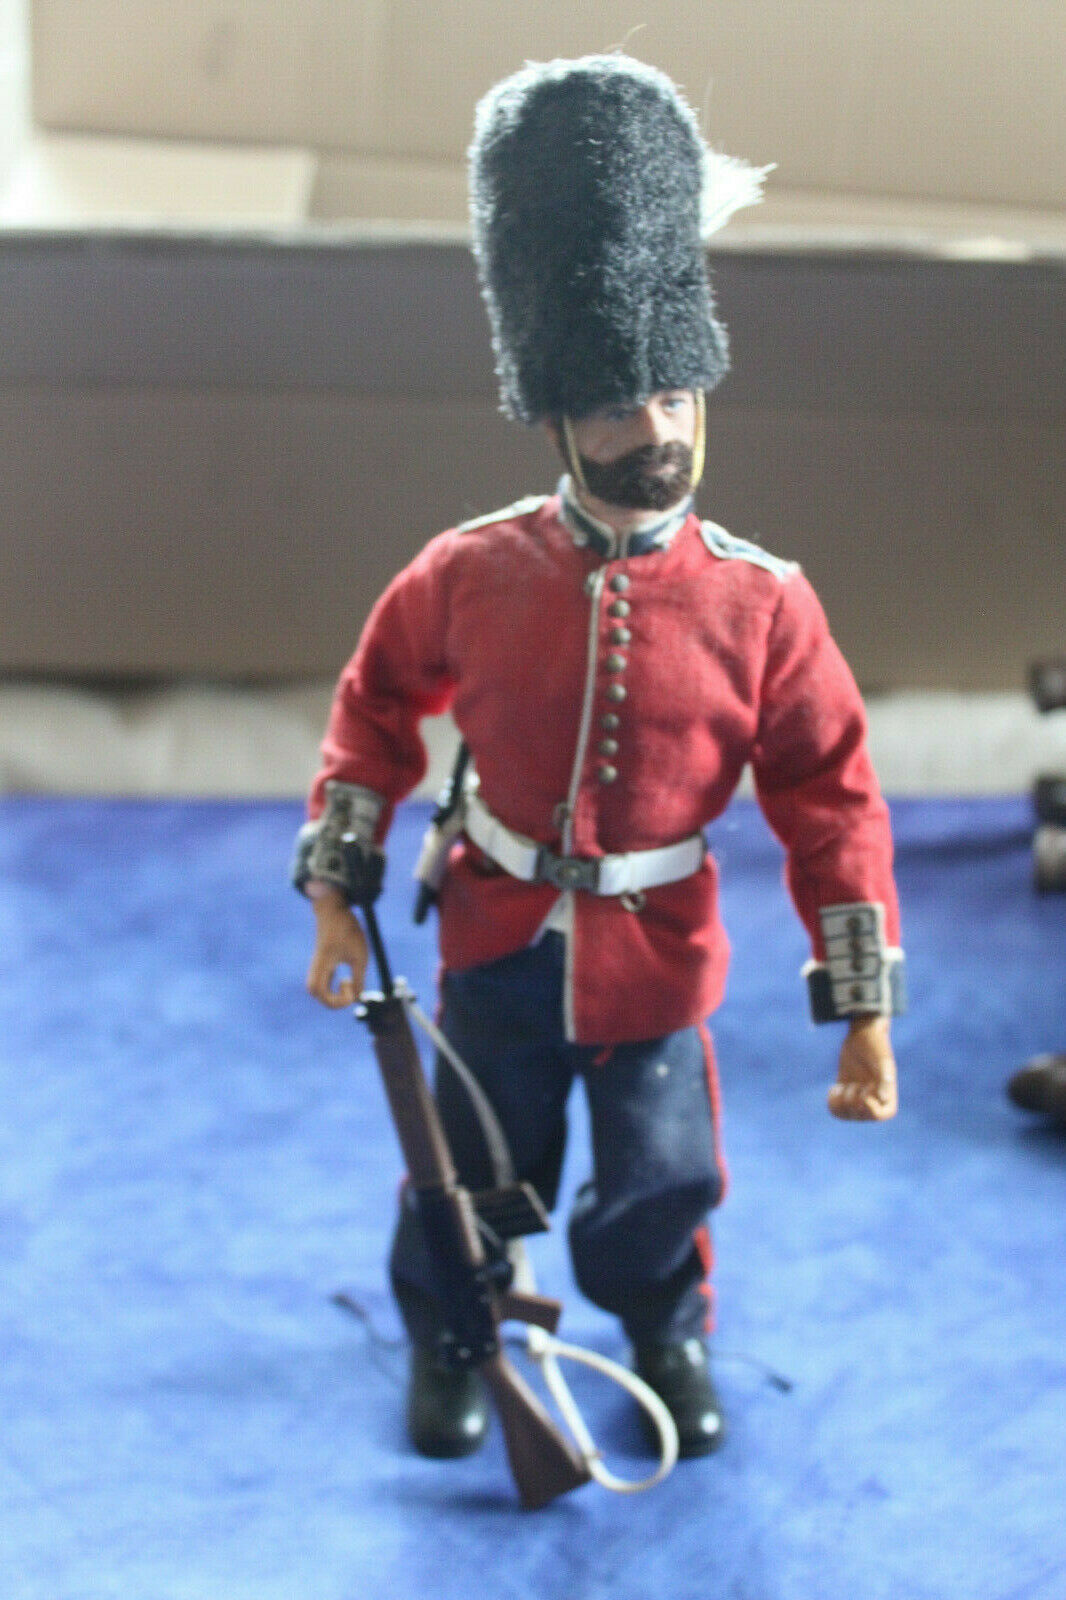 Action man gijoe 1964 et tenue garde garde garde anglais british soldat 1975 palitoys 540a1c